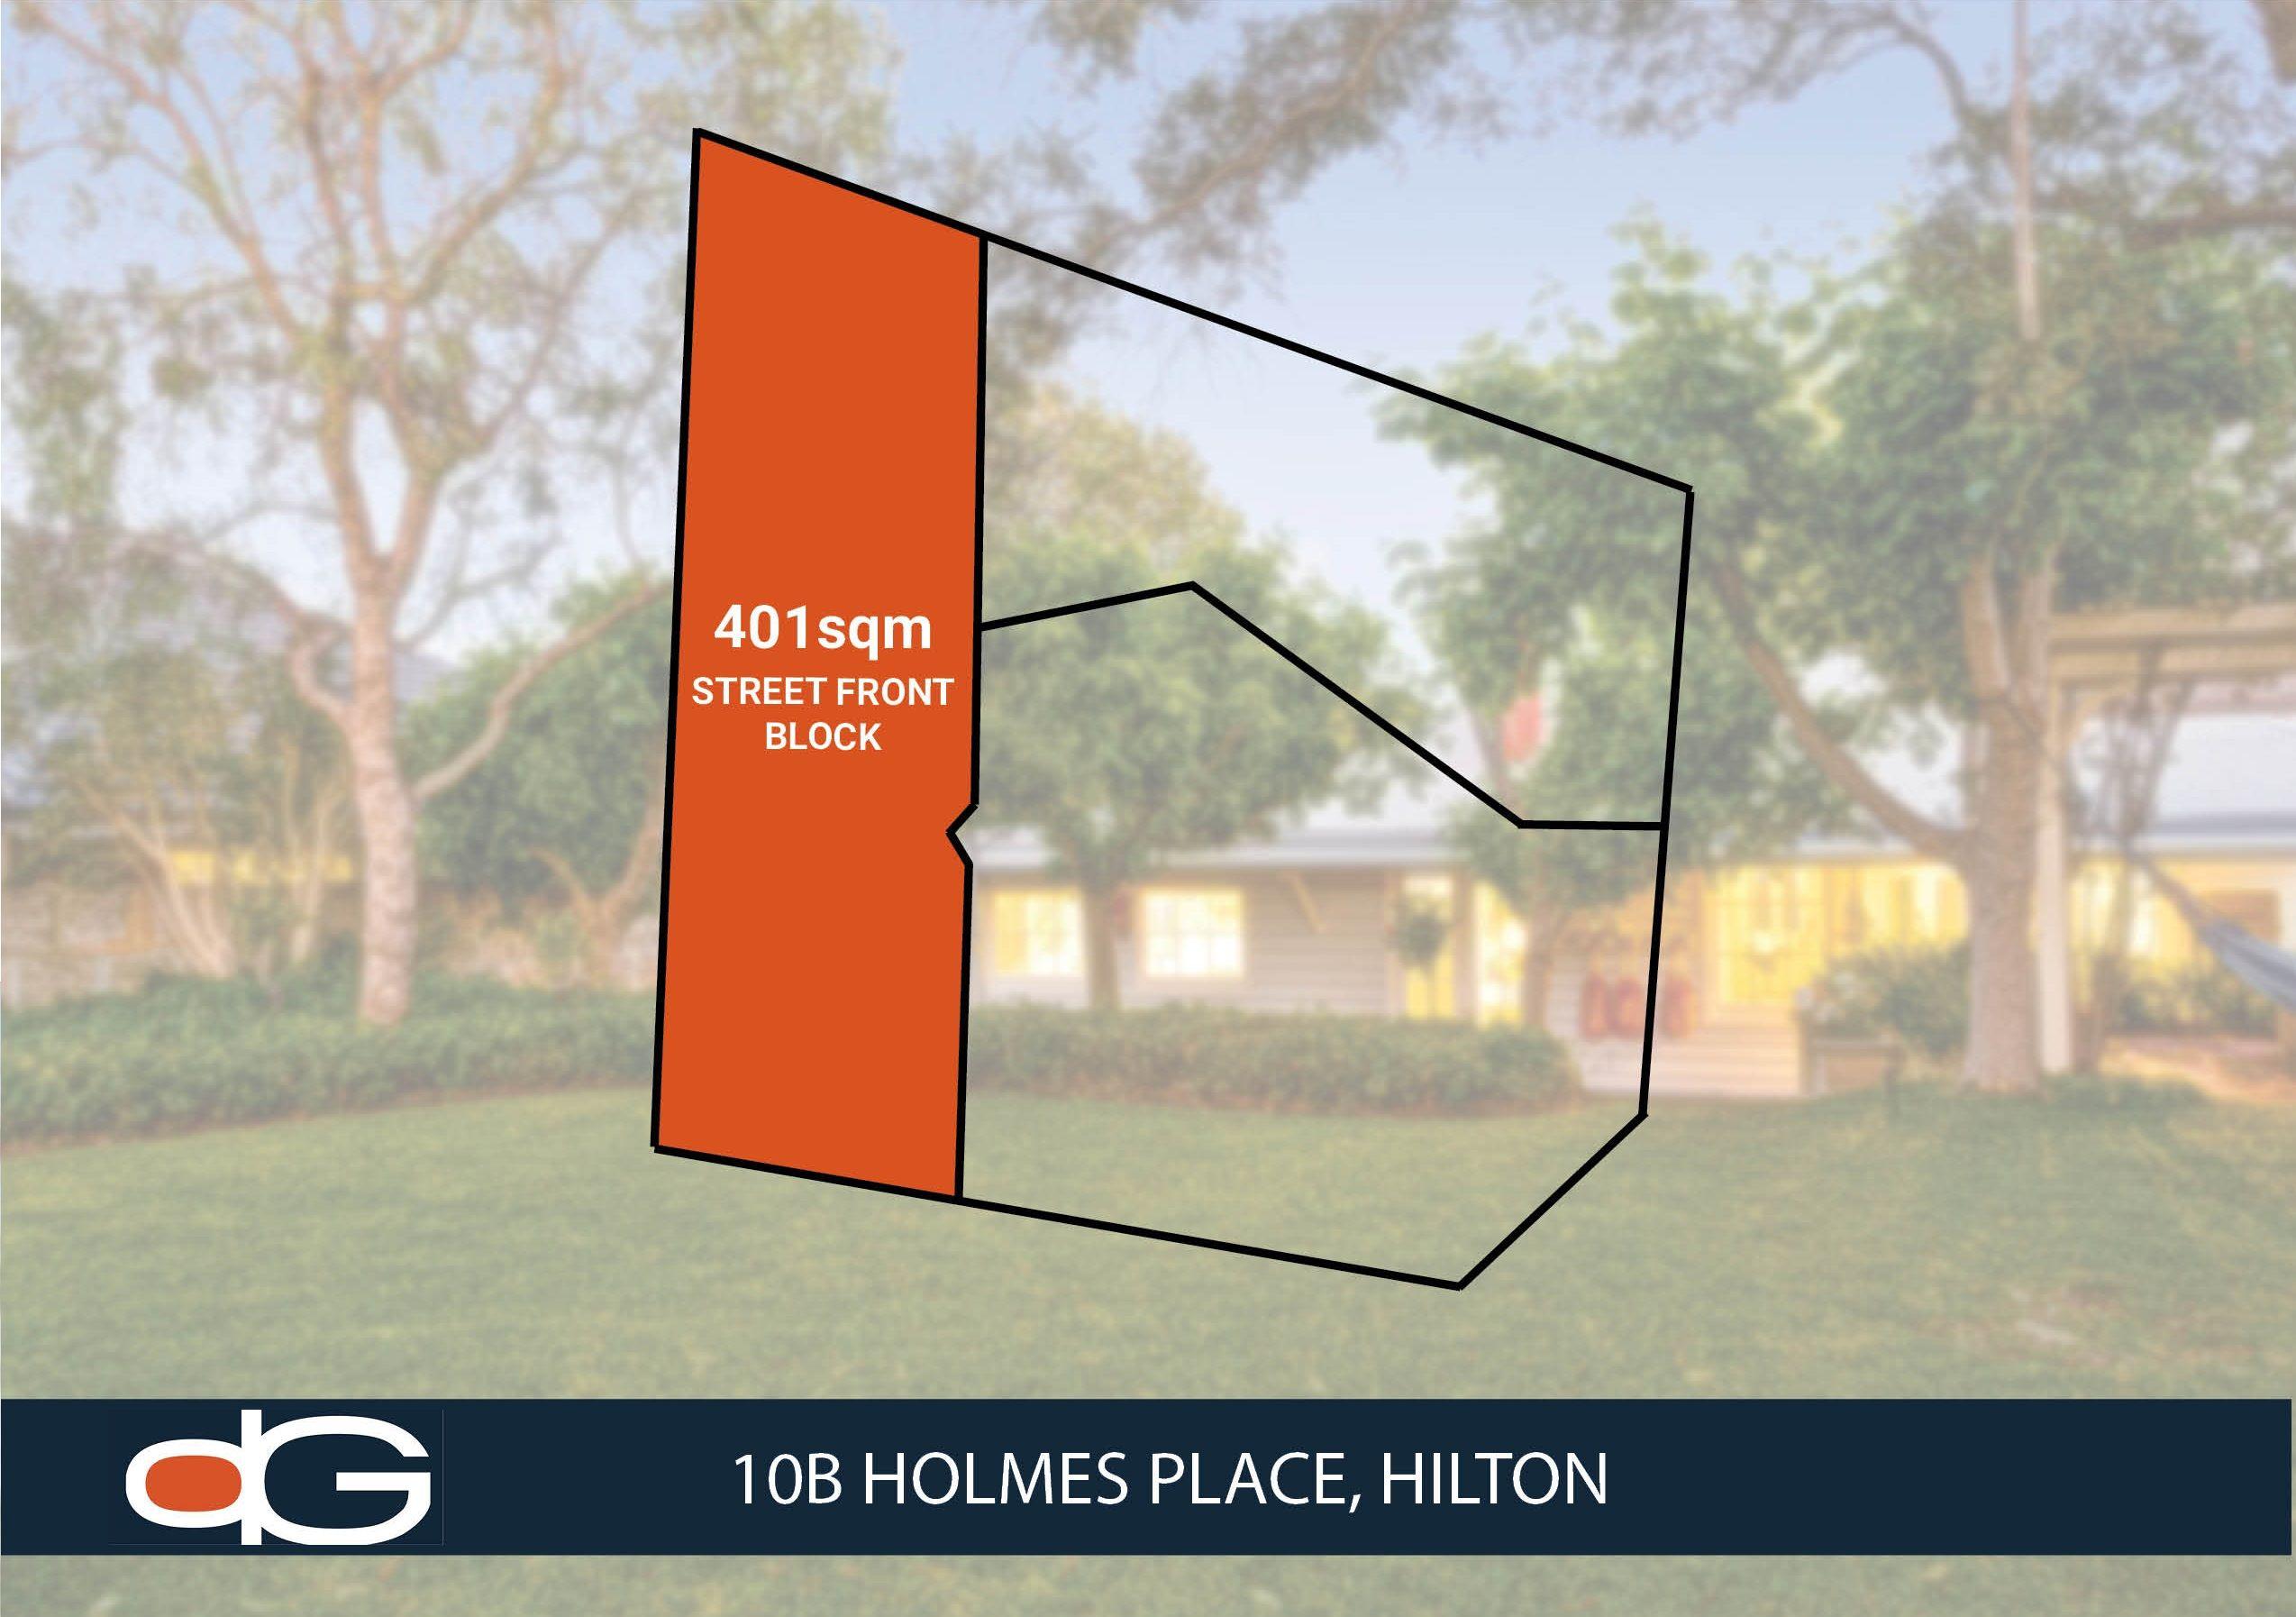 10B Holmes Place, Hilton